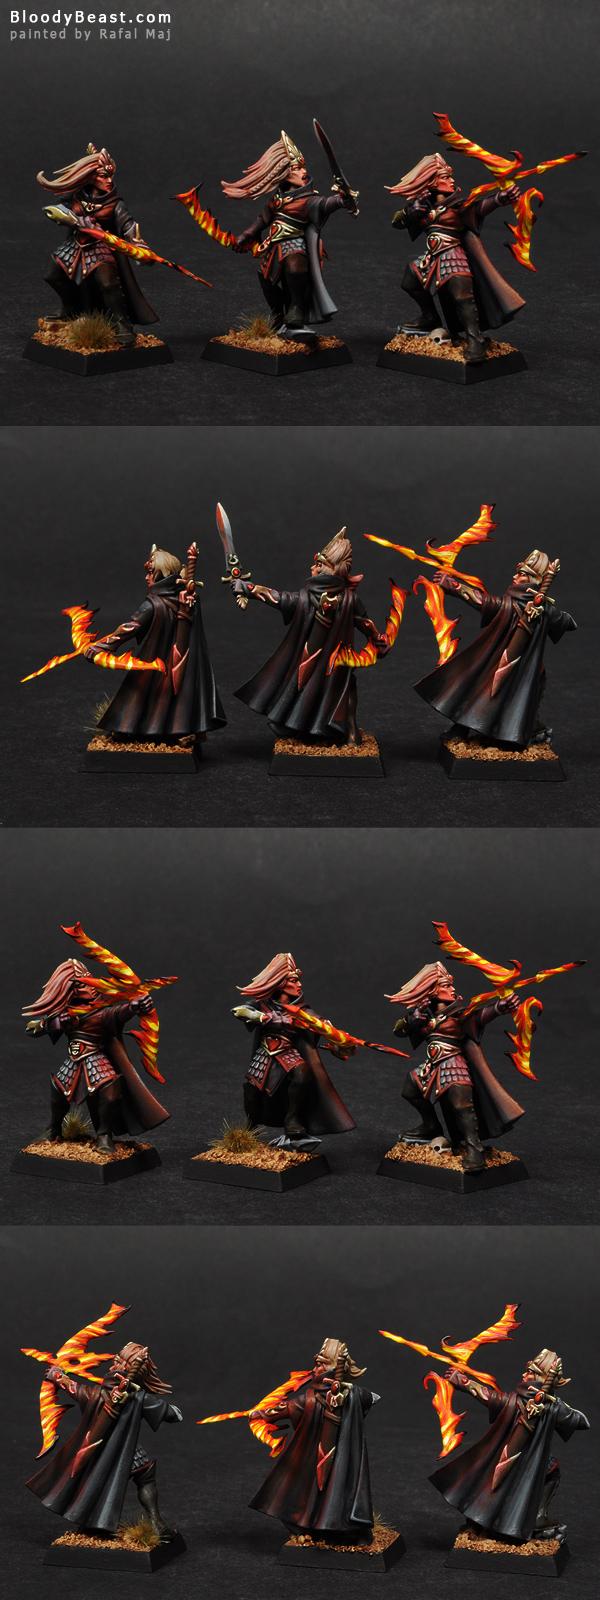 High Elf Sisters of Avelorn painted by Rafal Maj (BloodyBeast.com)